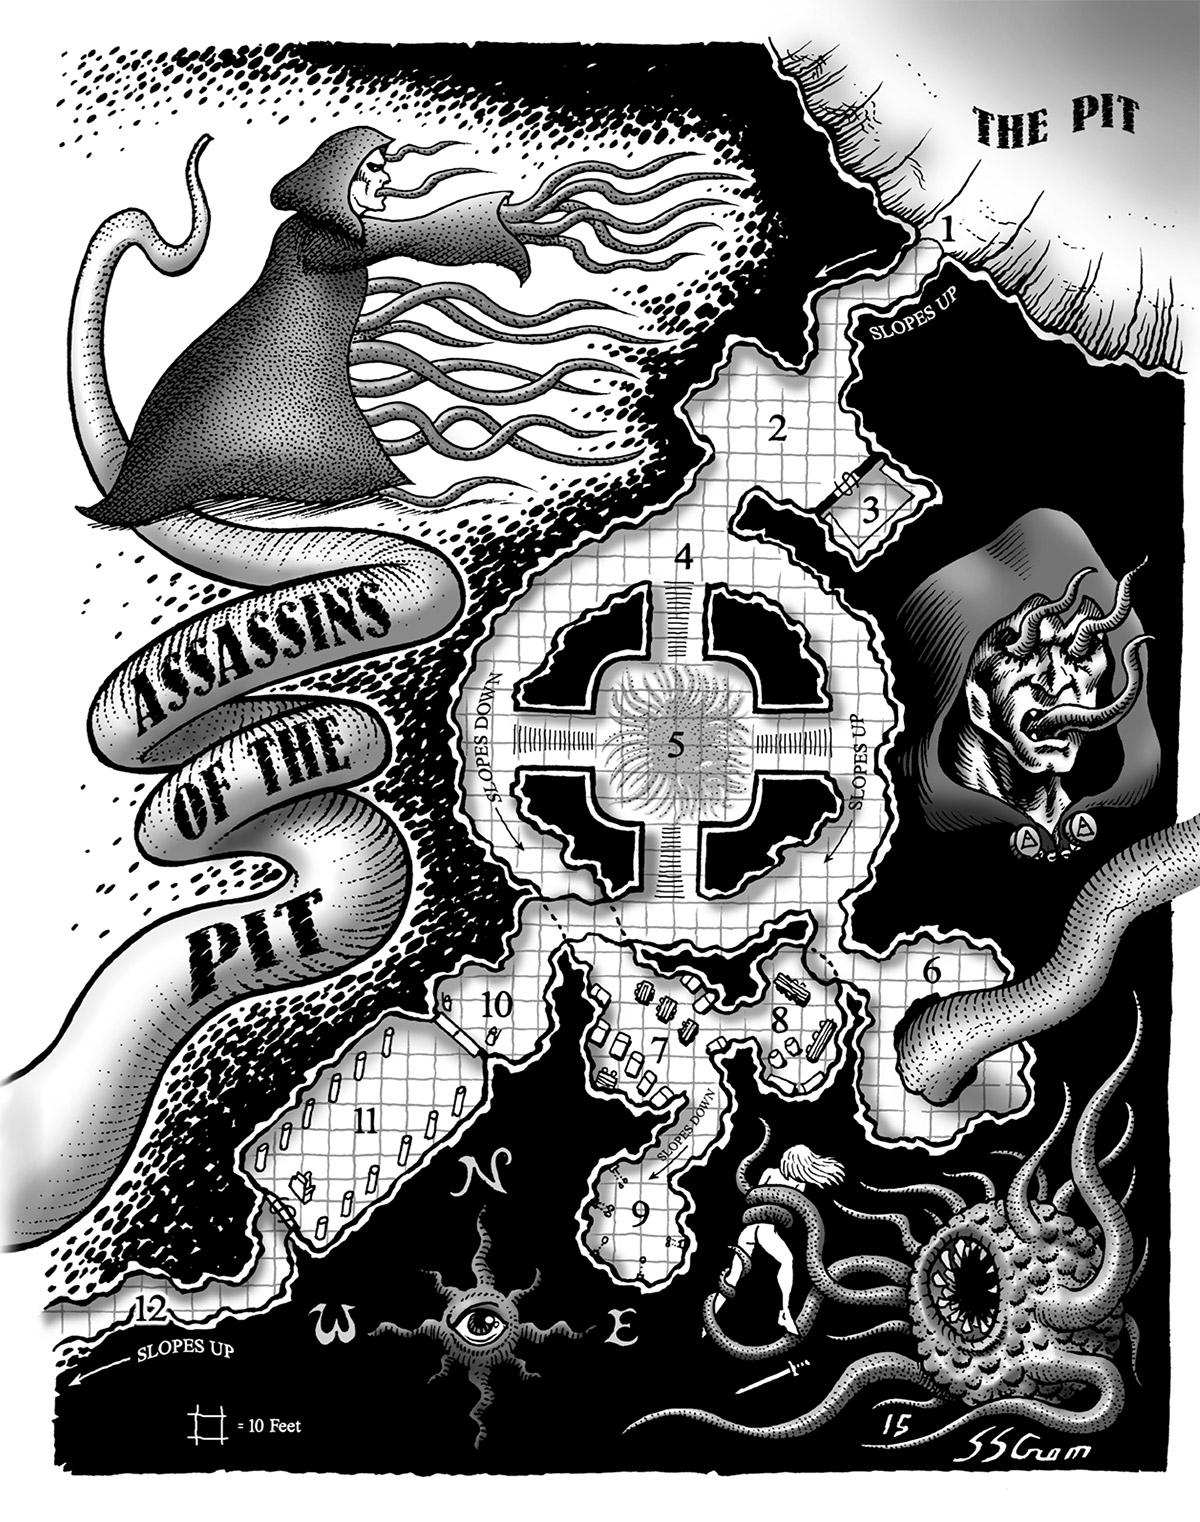 DCC 68 Assassins of the Pit